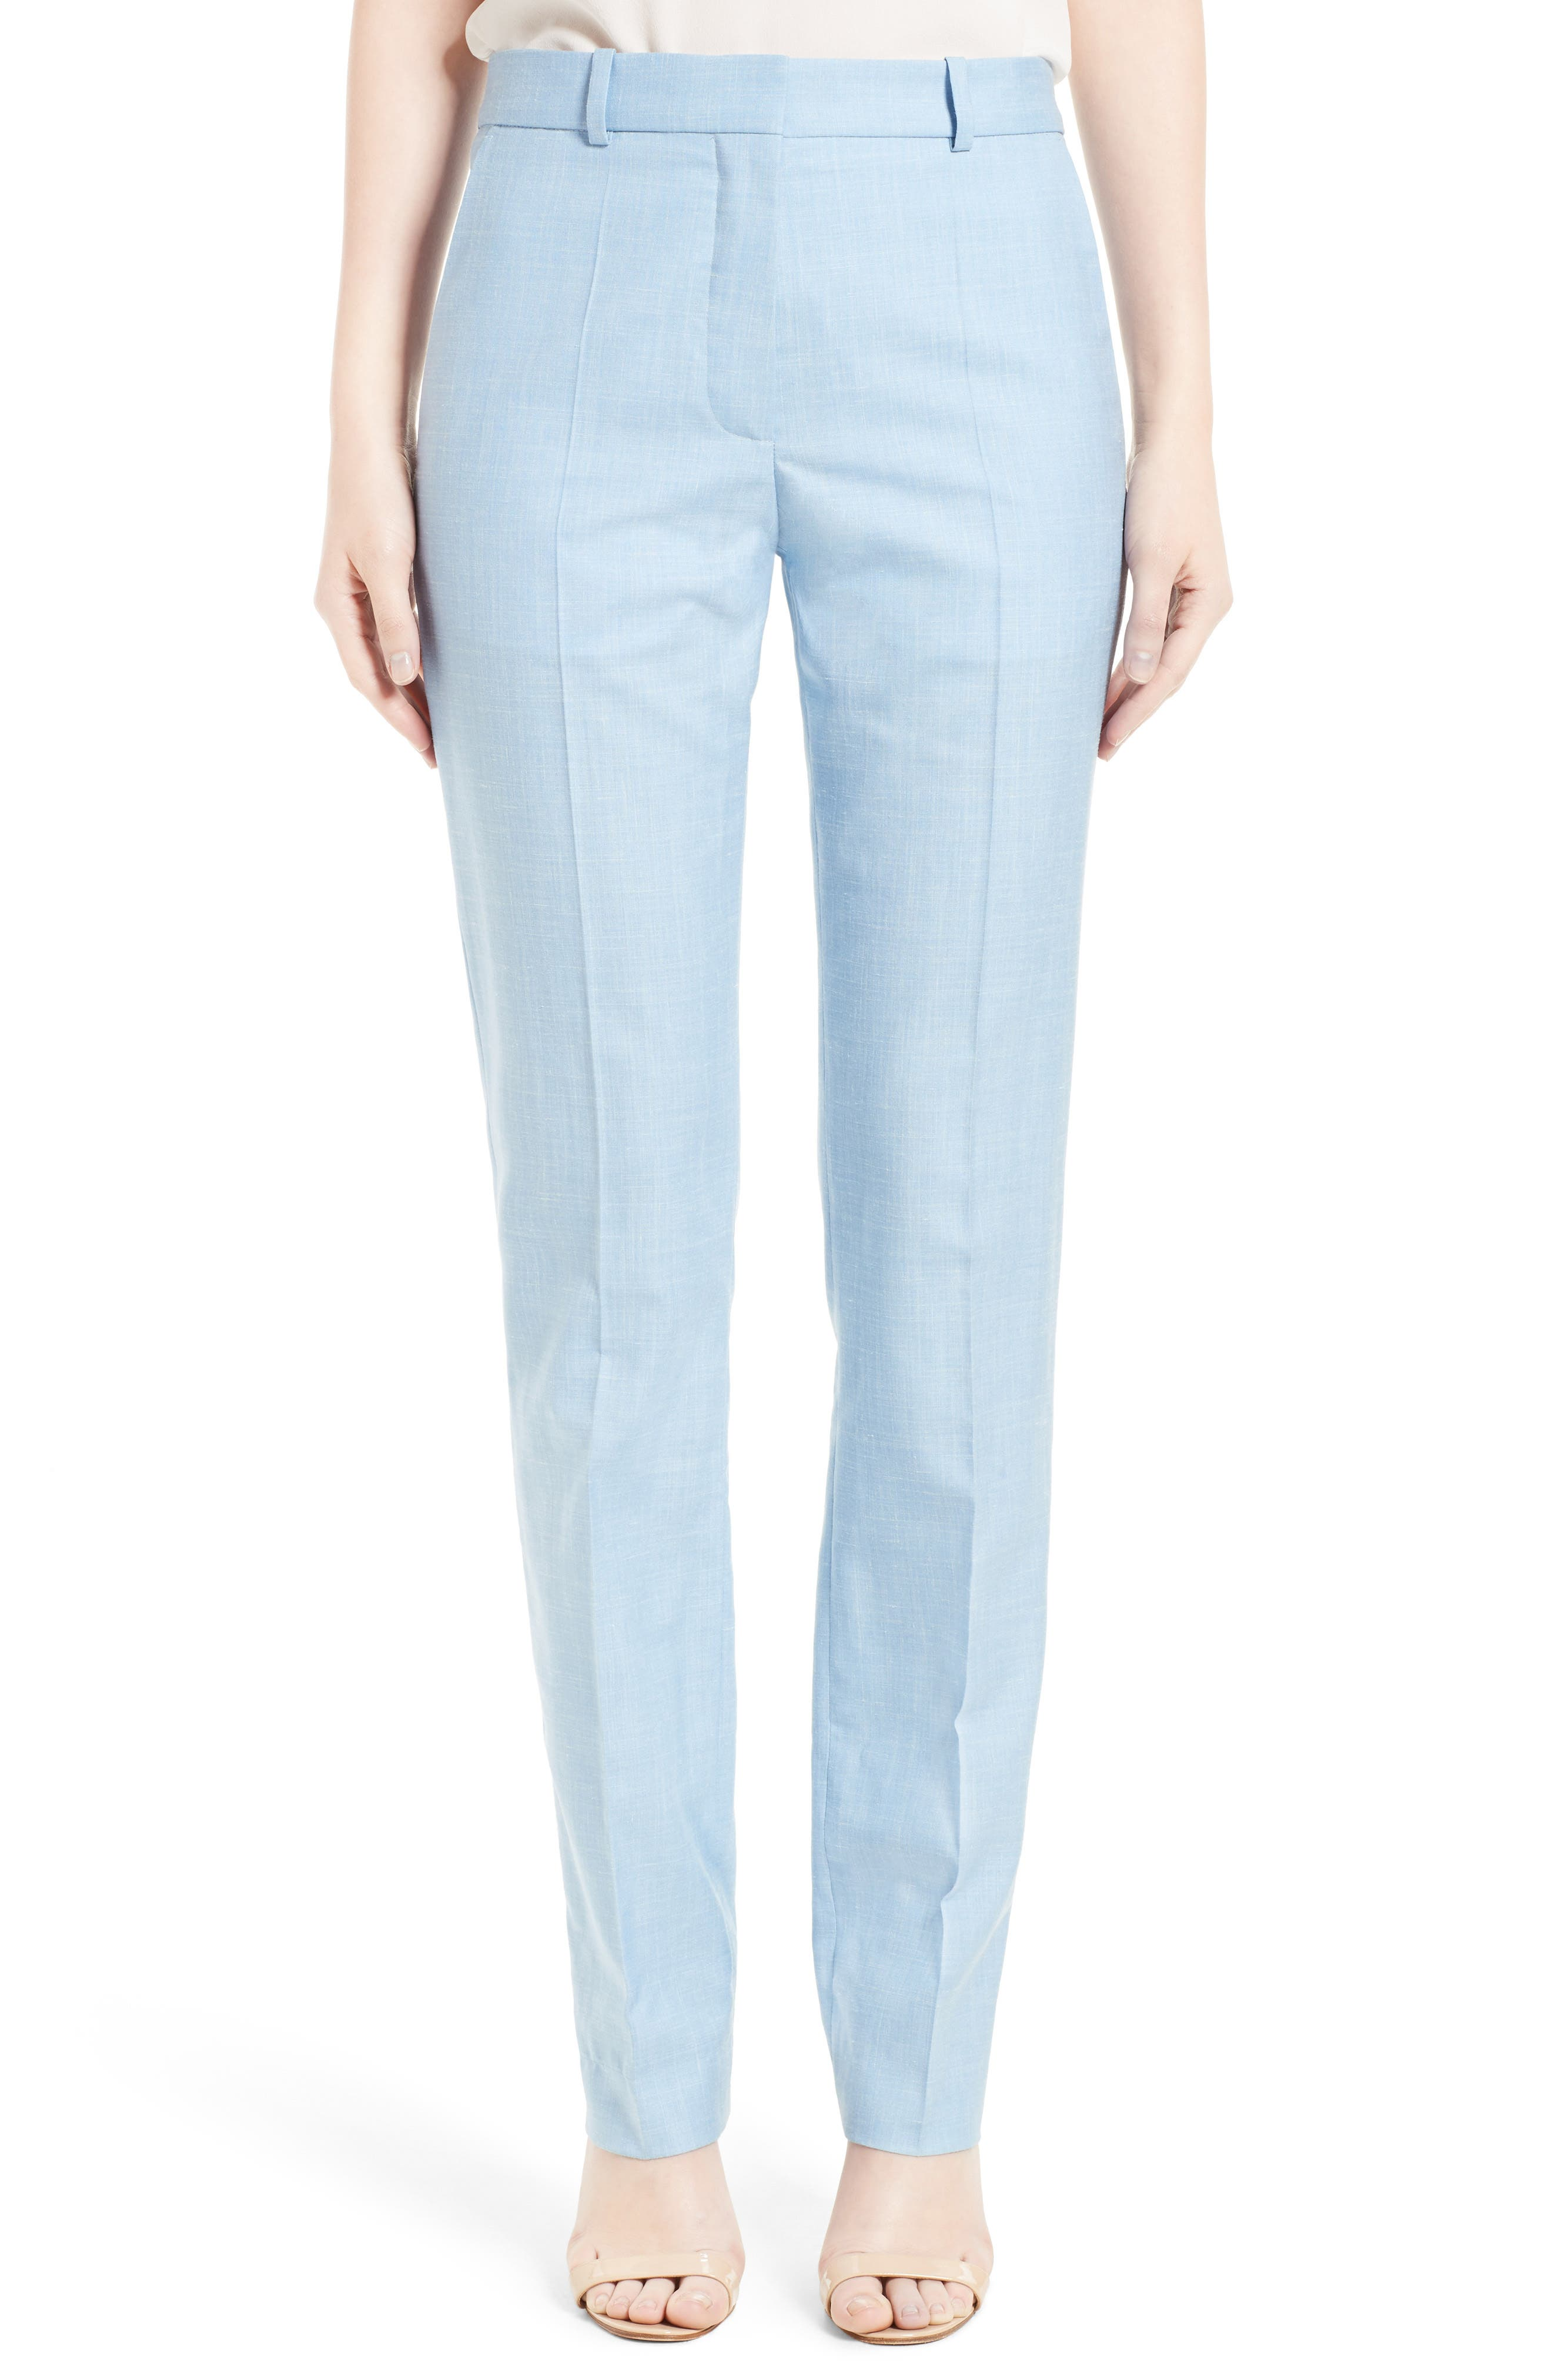 Victoria Beckham Mélange Wool Slim Trousers